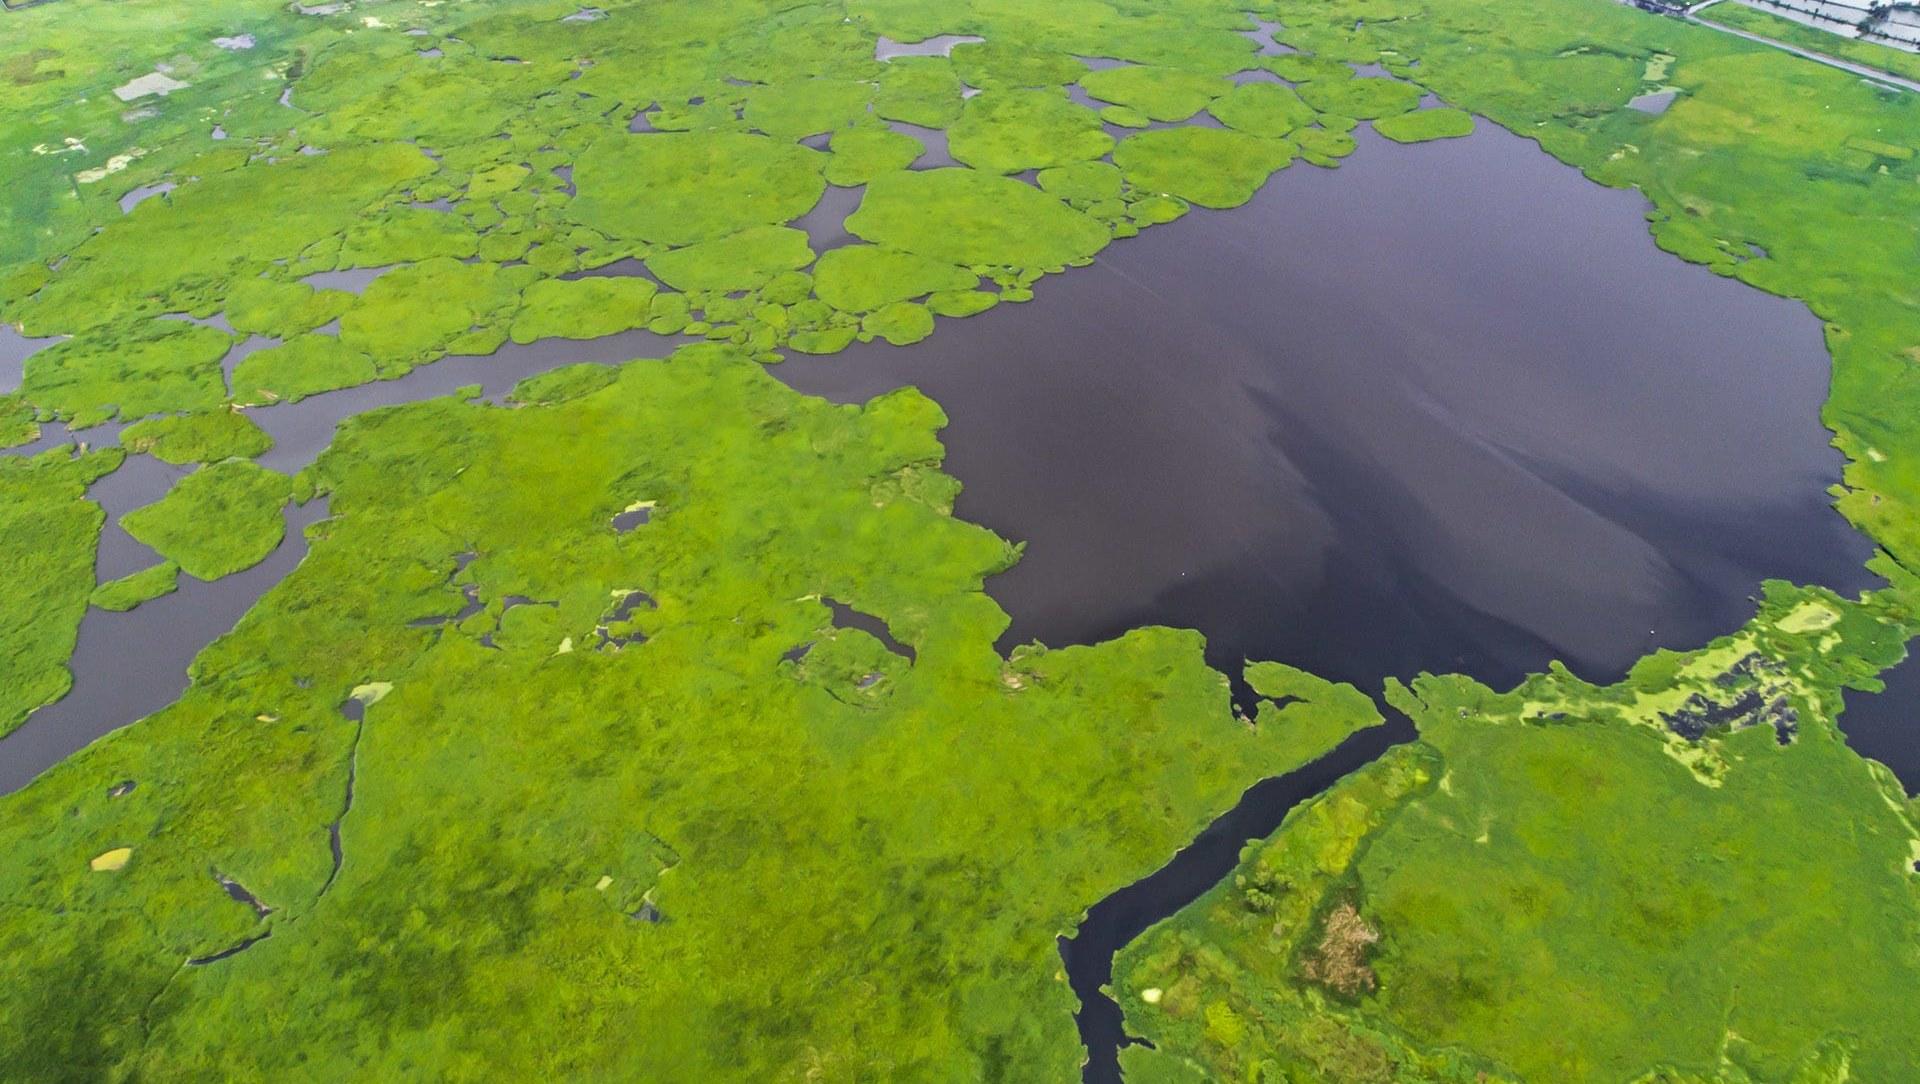 The Vanishing Grasslands and Wetlands of India